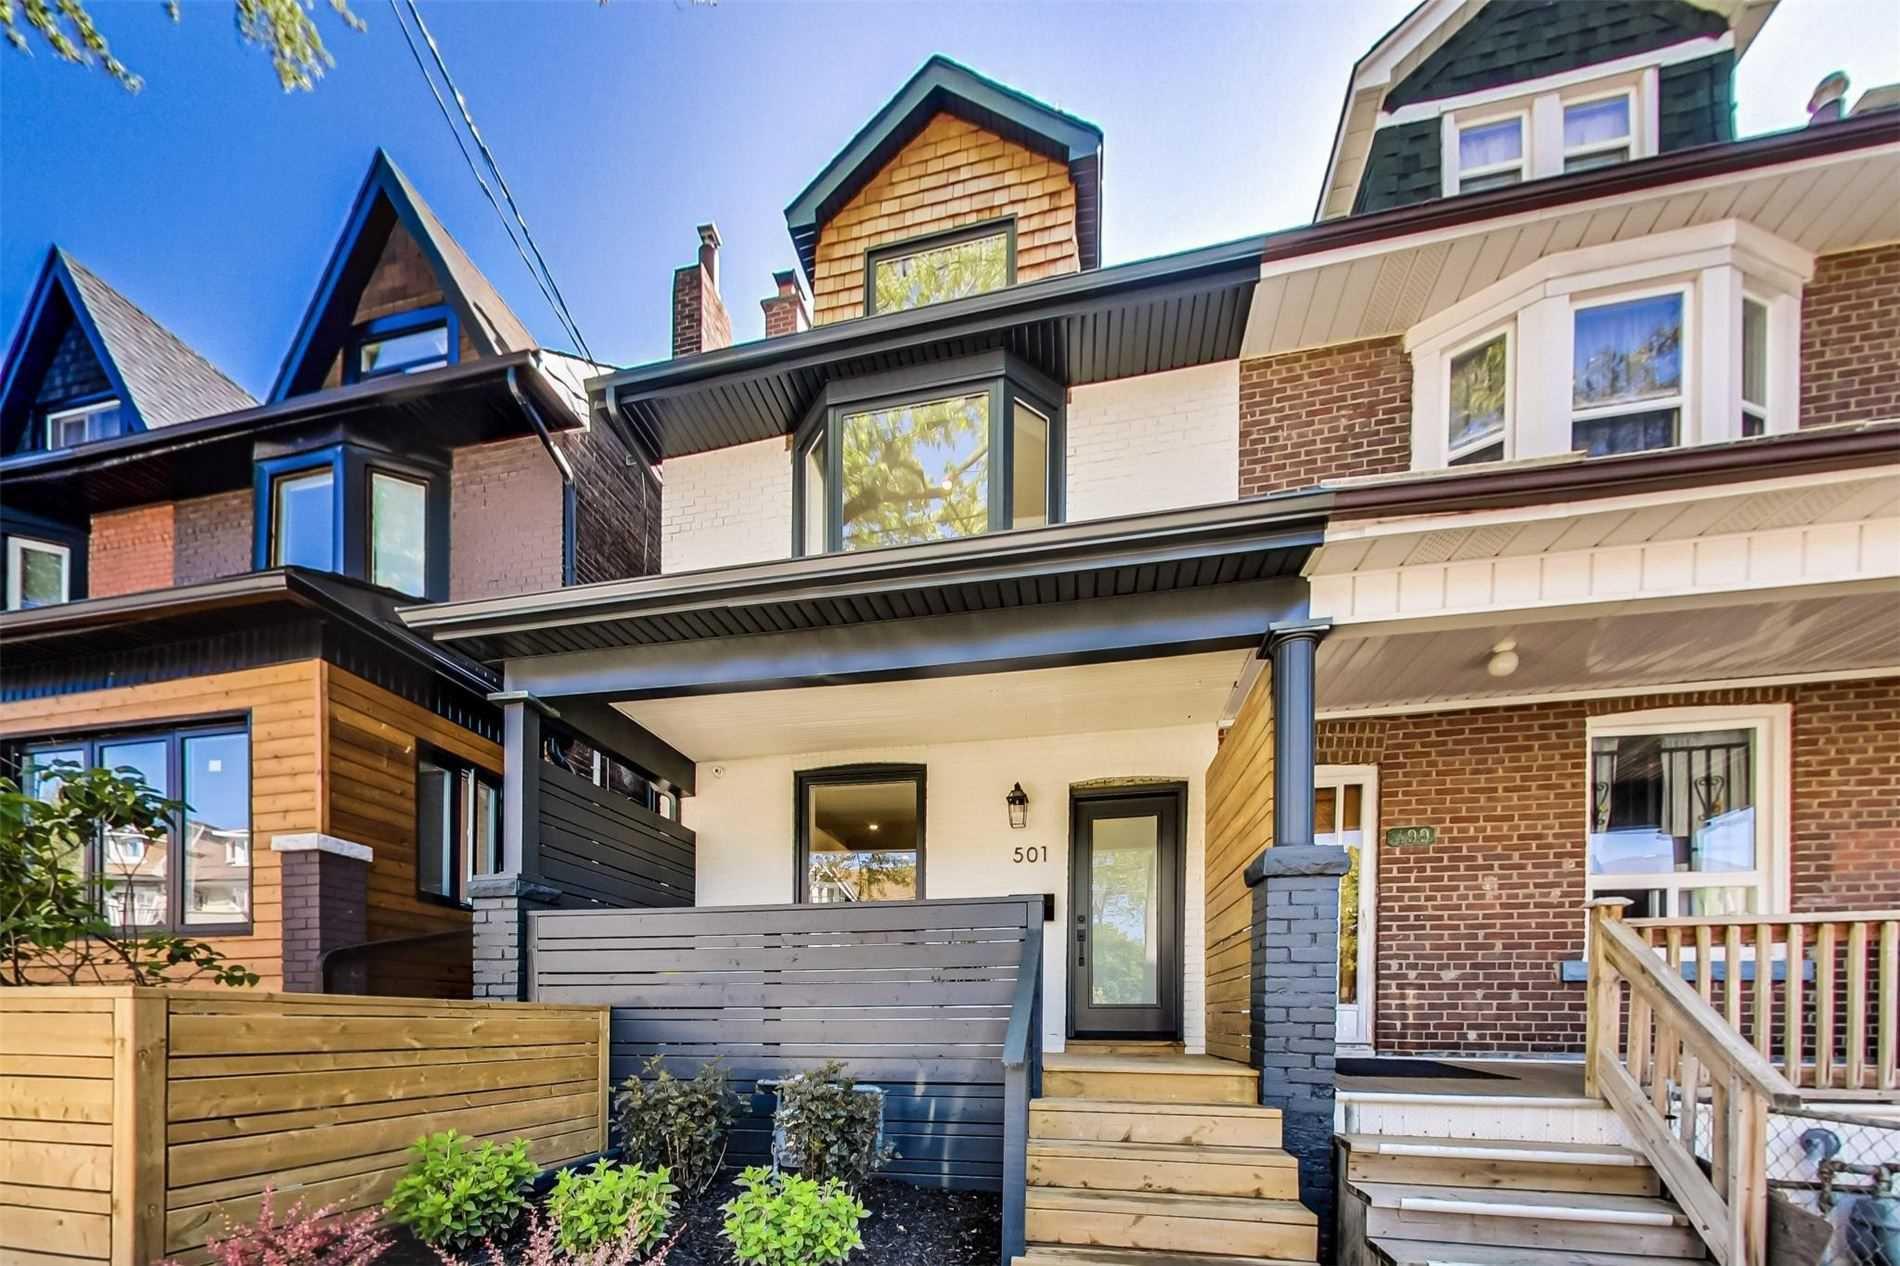 Main Photo: 501B Carlaw Avenue in Toronto: South Riverdale House (2 1/2 Storey) for lease (Toronto E01)  : MLS®# E4800704